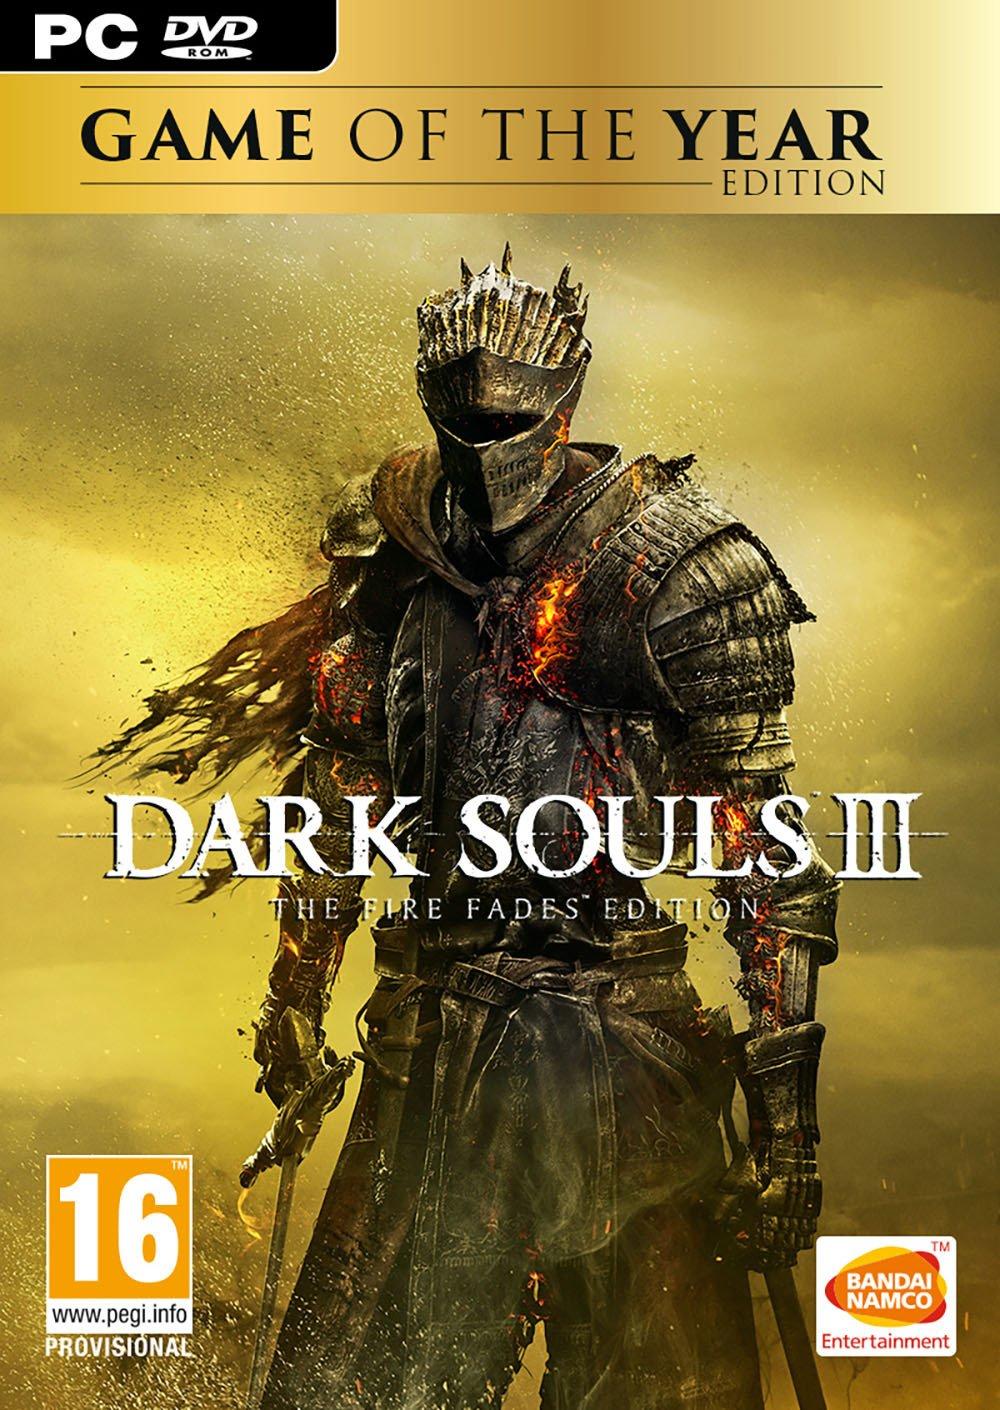 Dark Souls 3: Fire Fades GoTY Edition PC Game.